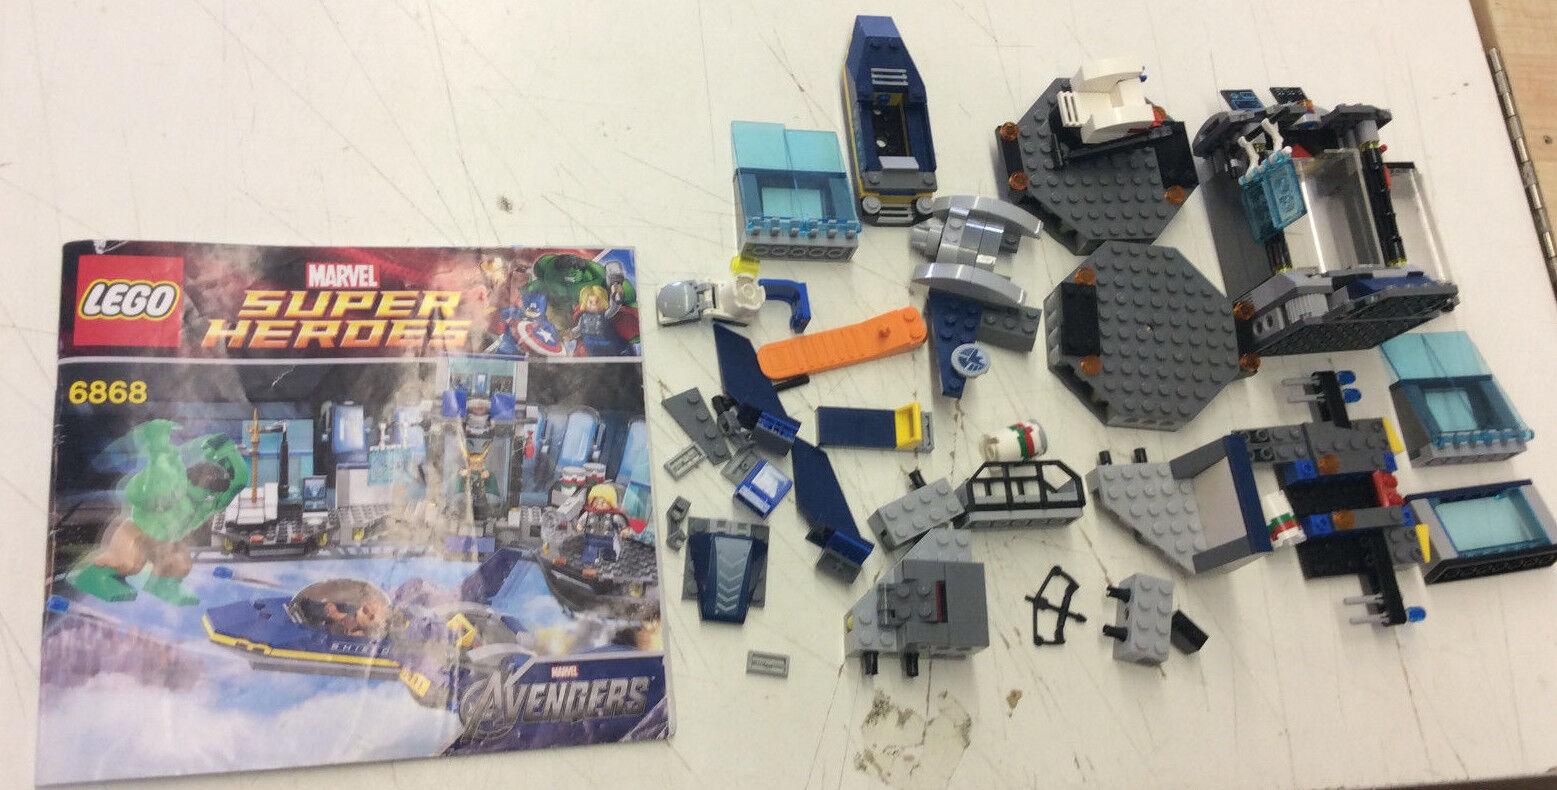 Lego Marvel Avengers 6868 Hulks Helicarrier Breakout Incomplete Set See Pics